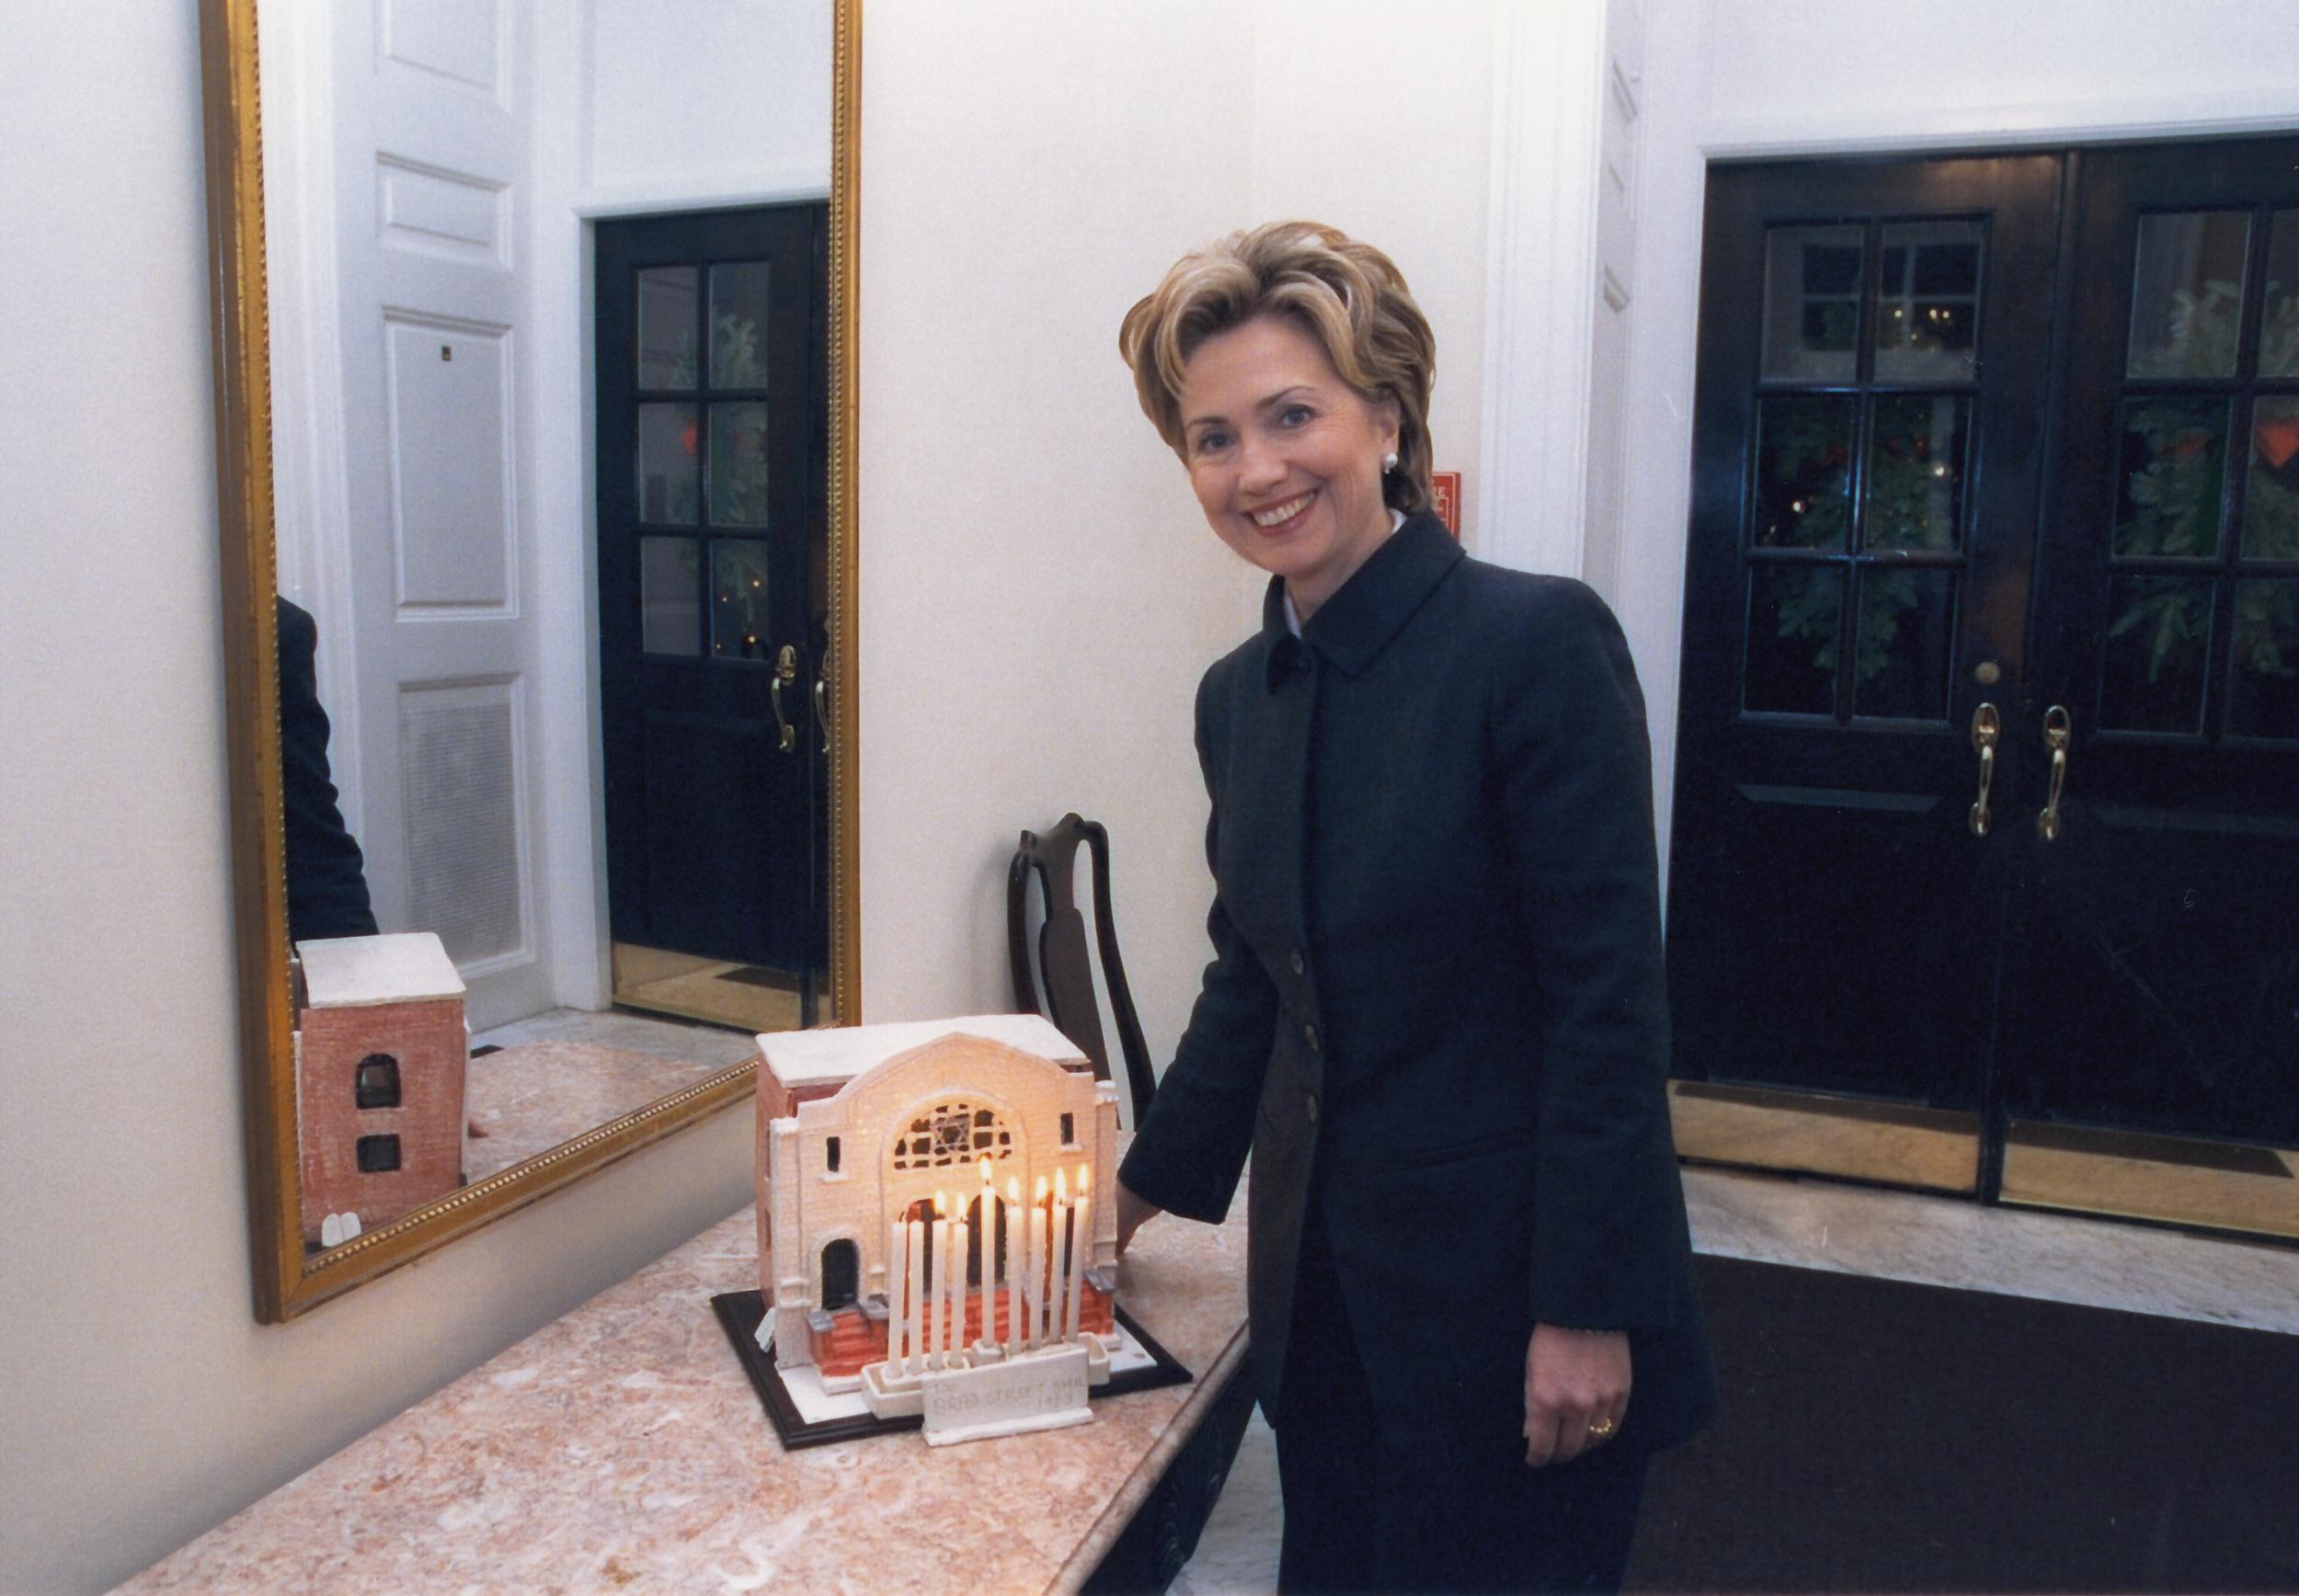 Official White House Photograph P78676-12A 22-DEC-99 Ralph Alswang